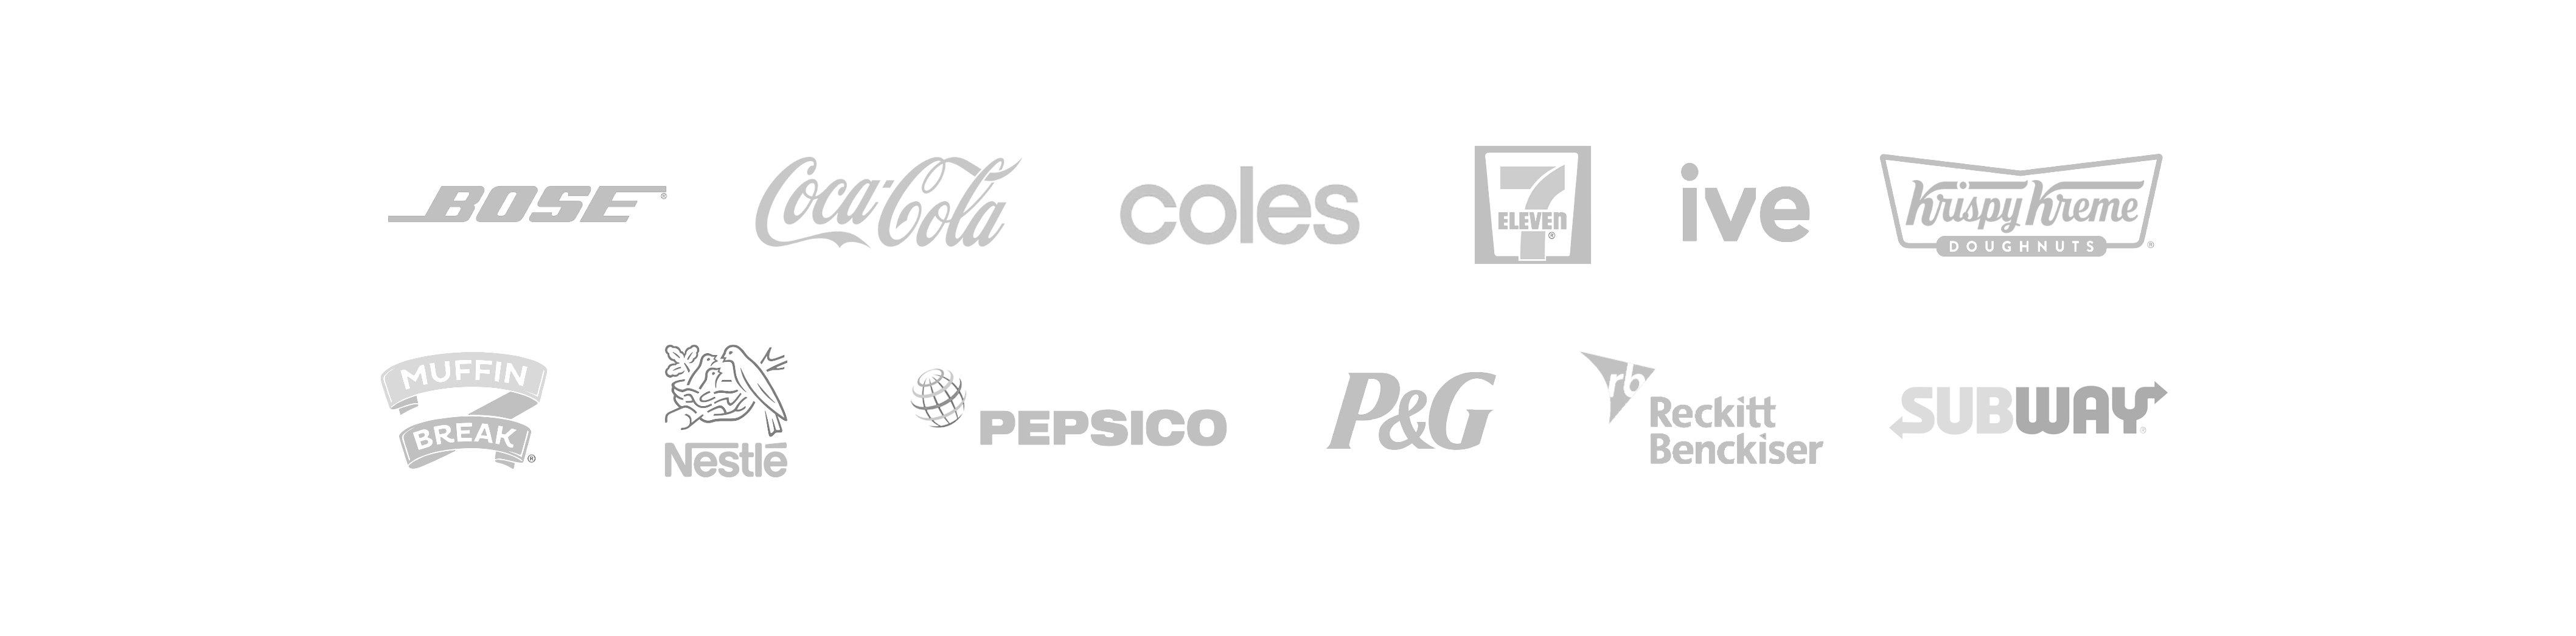 AU Logos collage 5